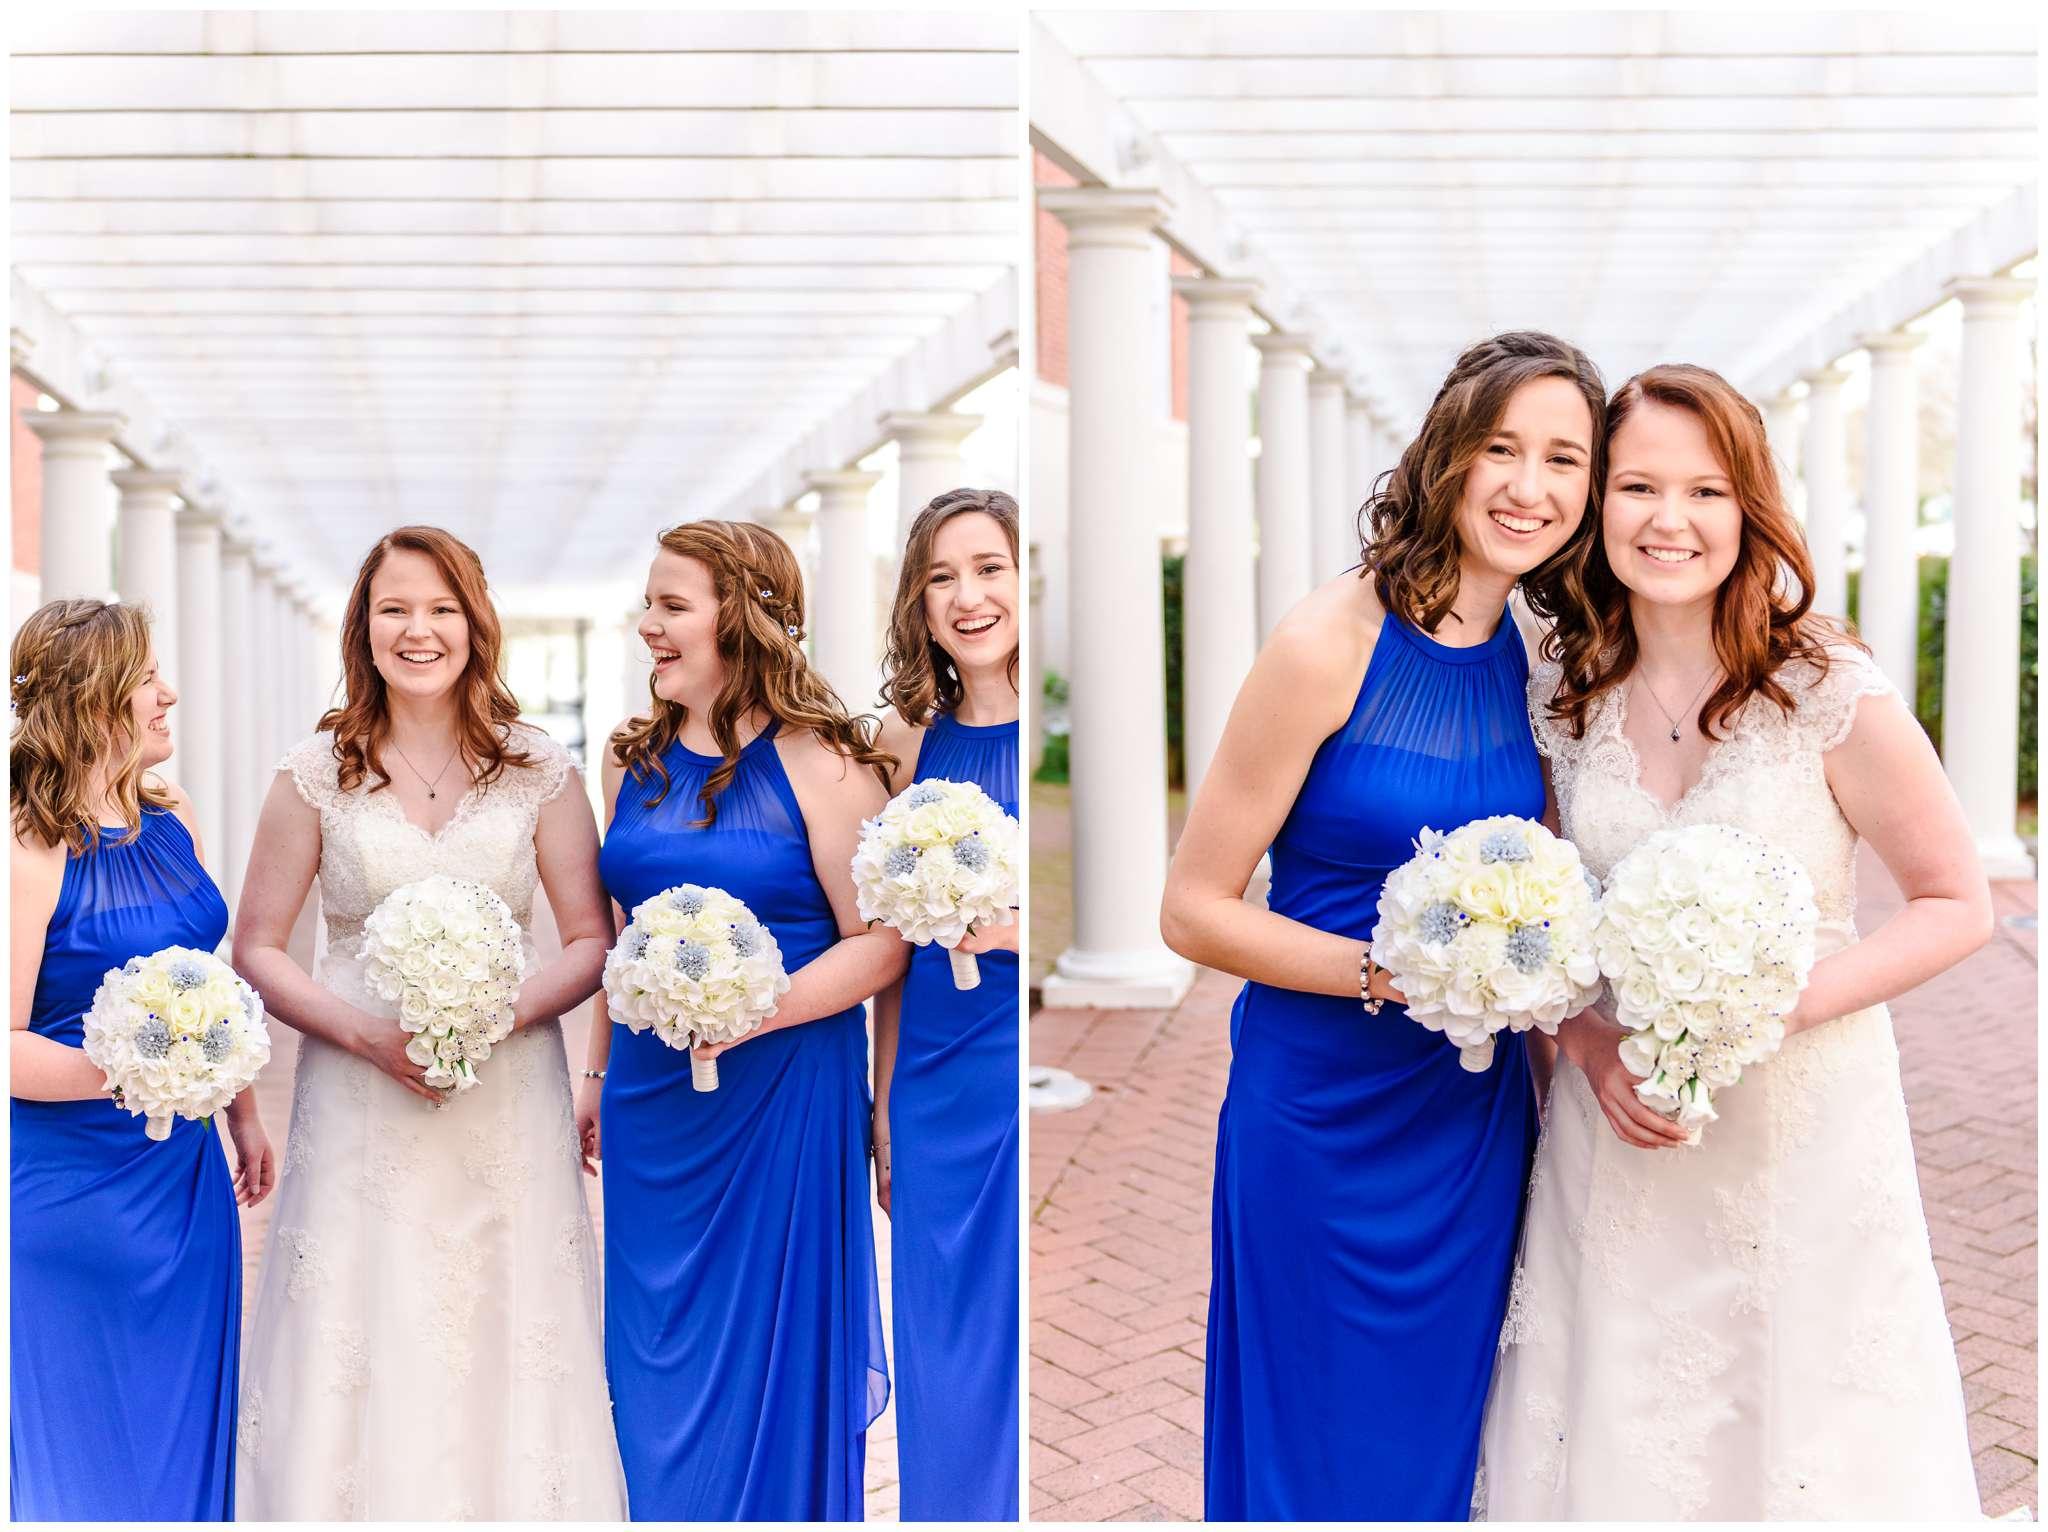 Amber and Lucas Wedding_3529.jpg